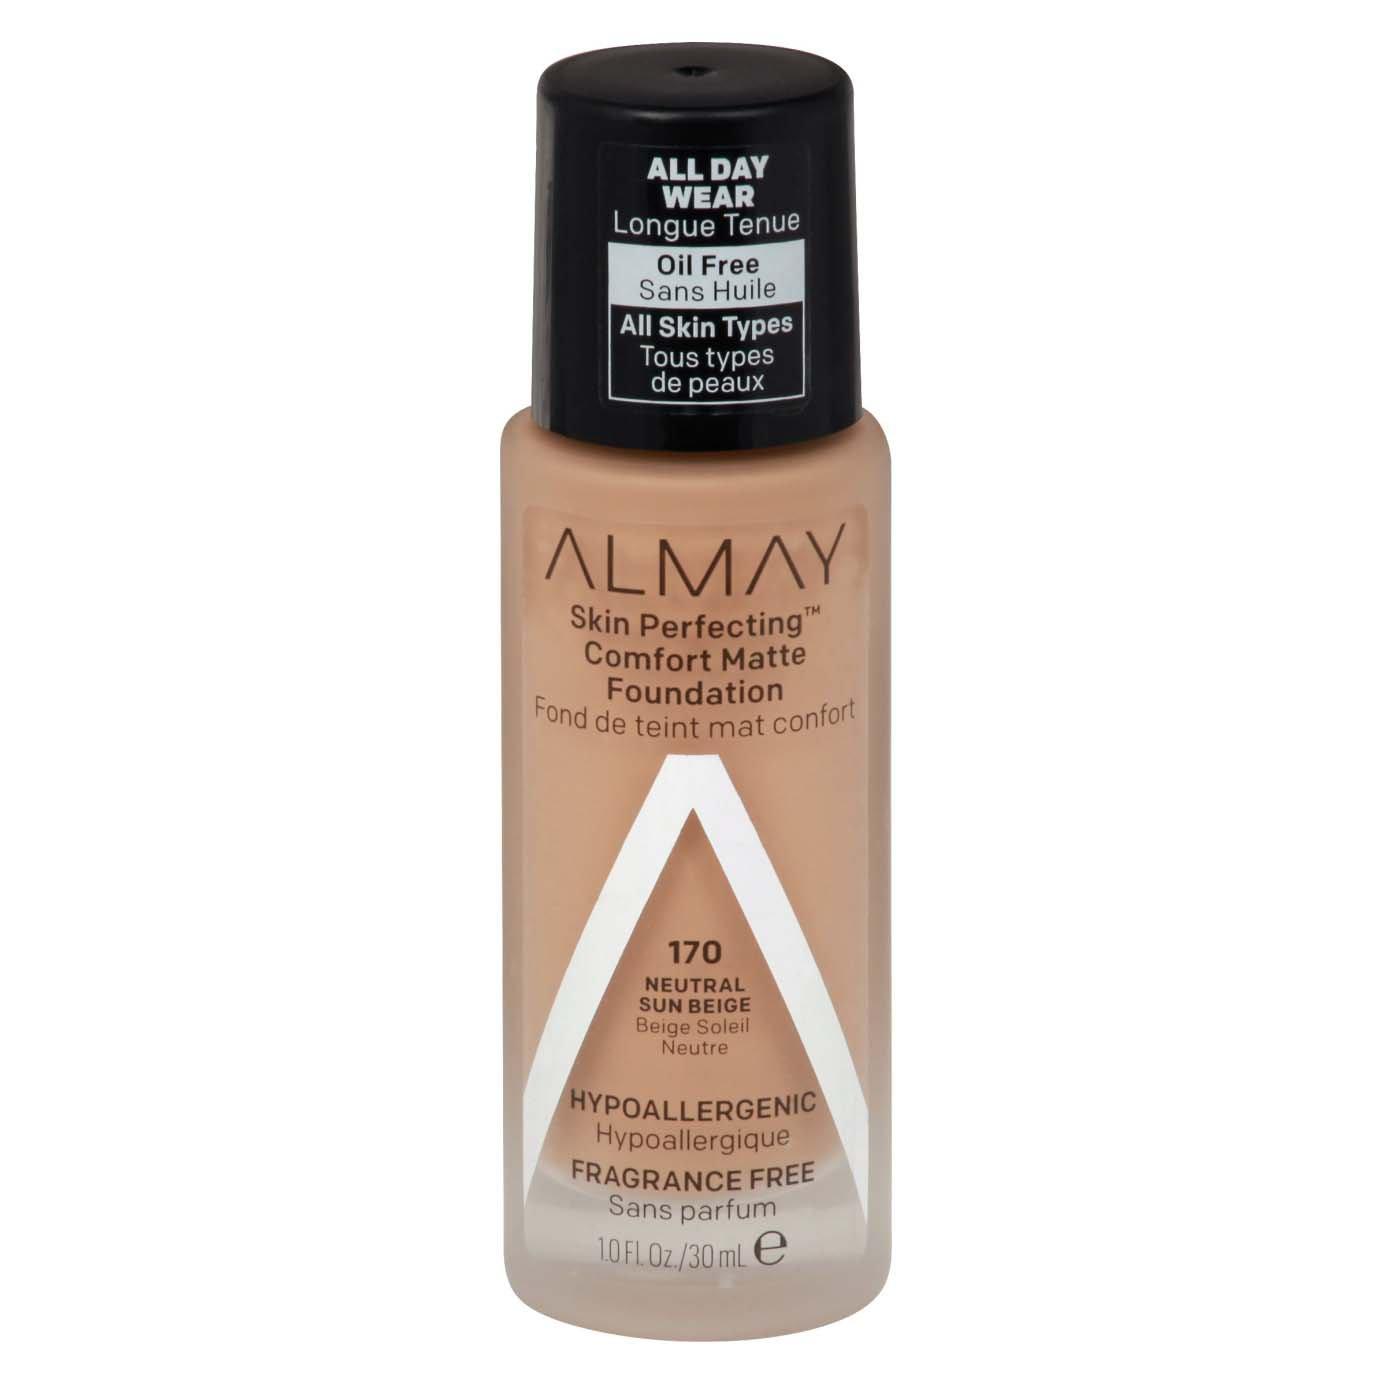 Almay Skin Perfecting Comfort Matte Foundation - 140 Cool